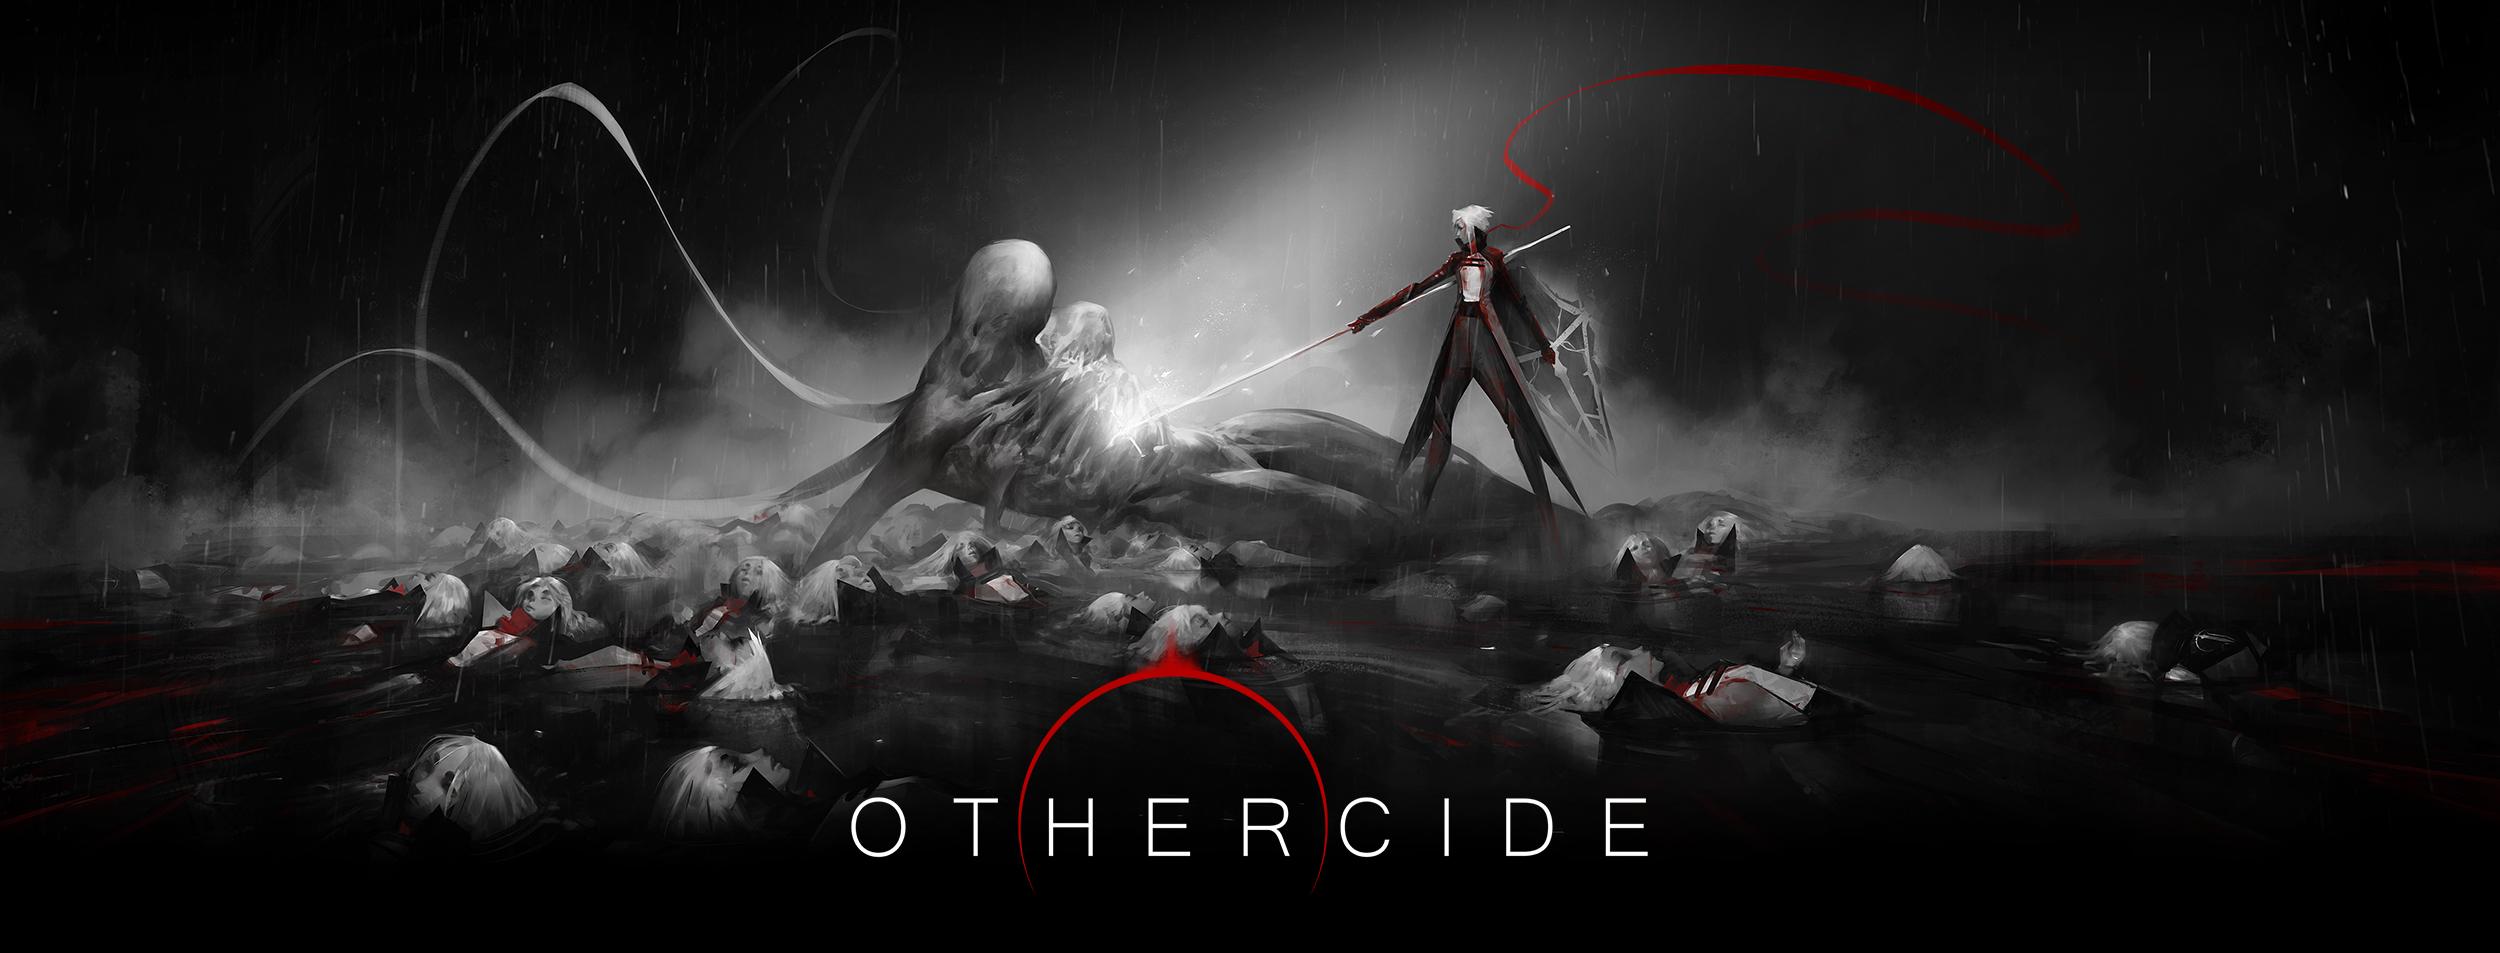 Конфронтация - Othercide